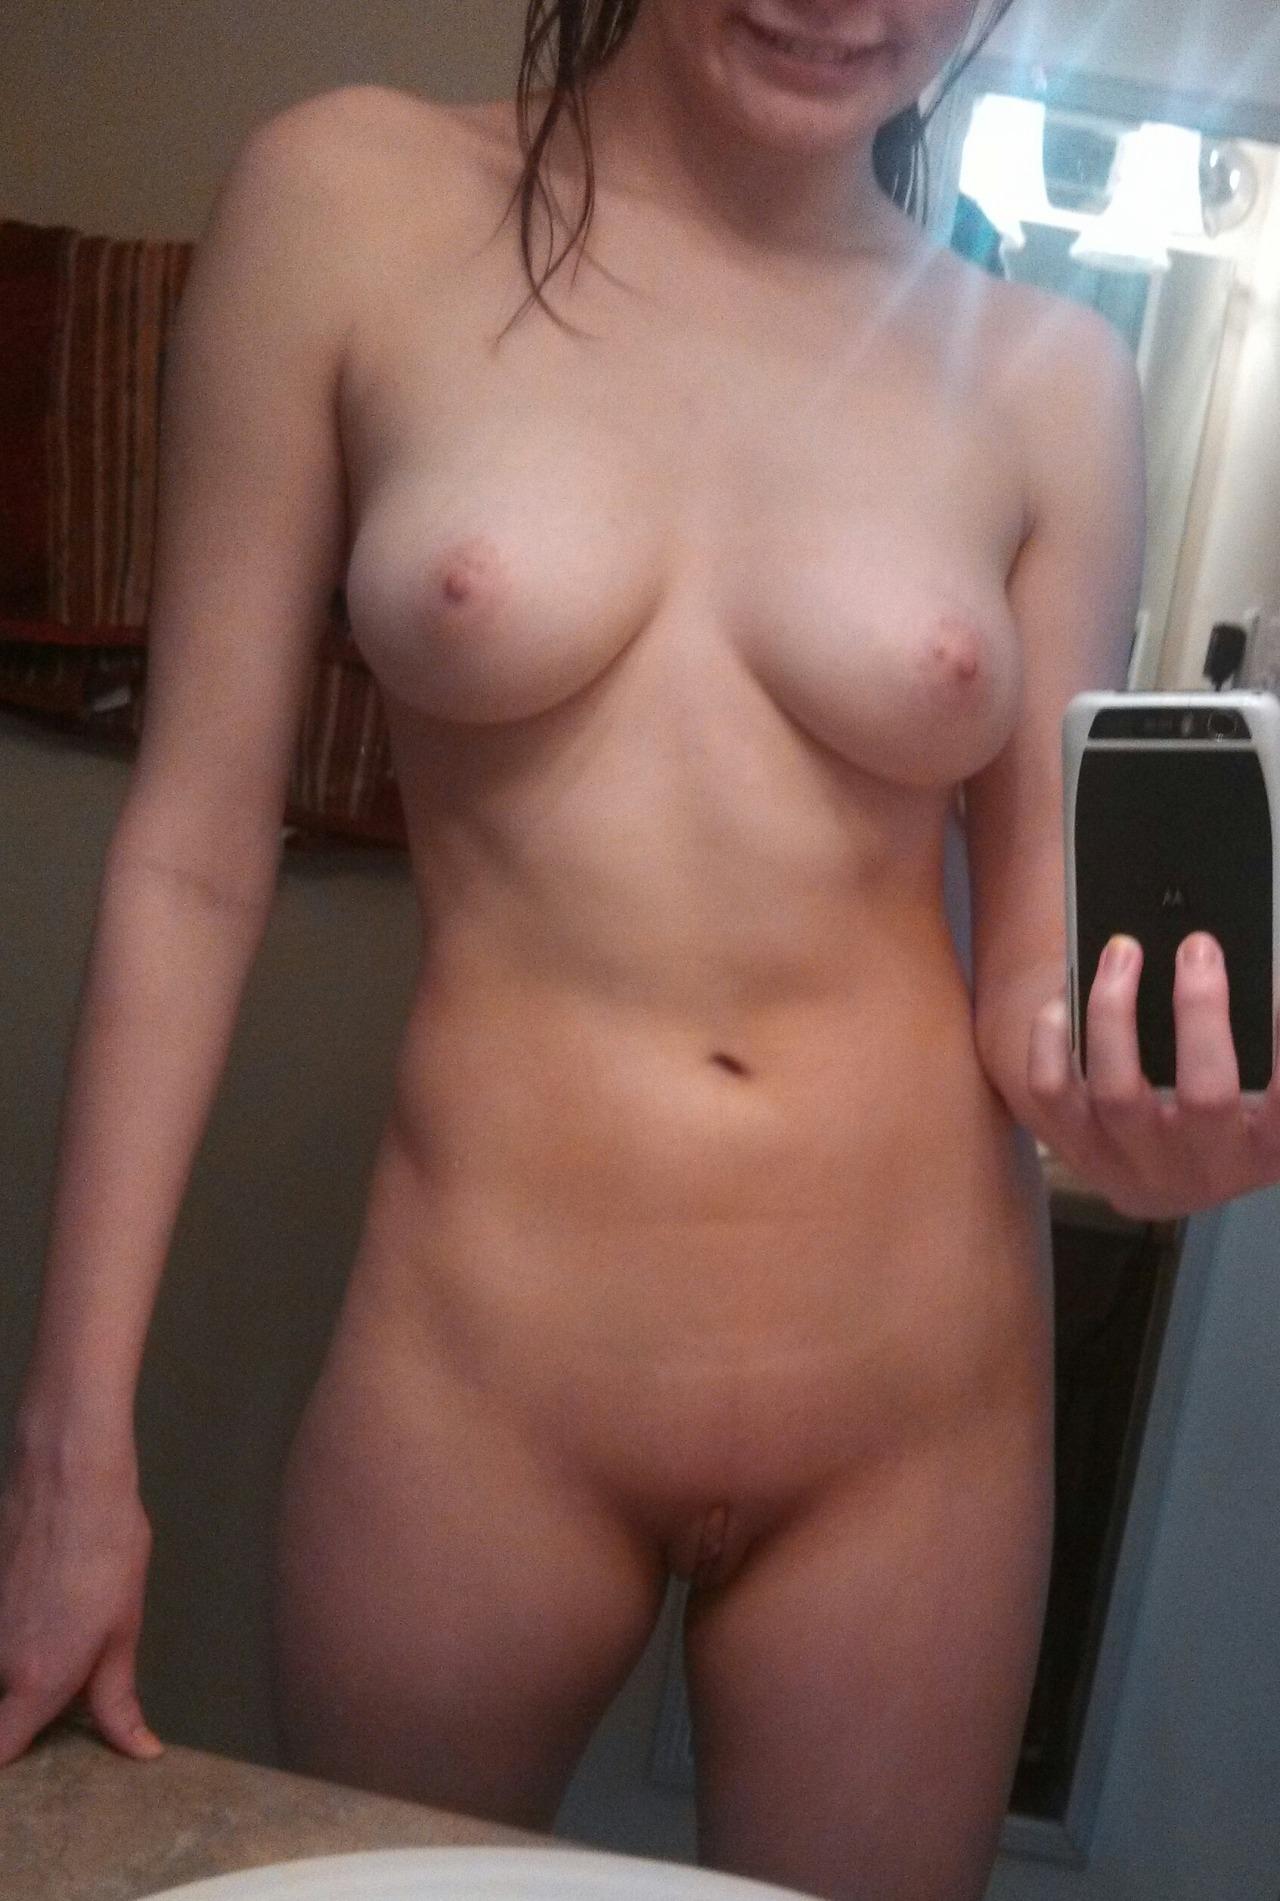 19-летние девахи селфятся у зеркал в домашних условиях 15 фото